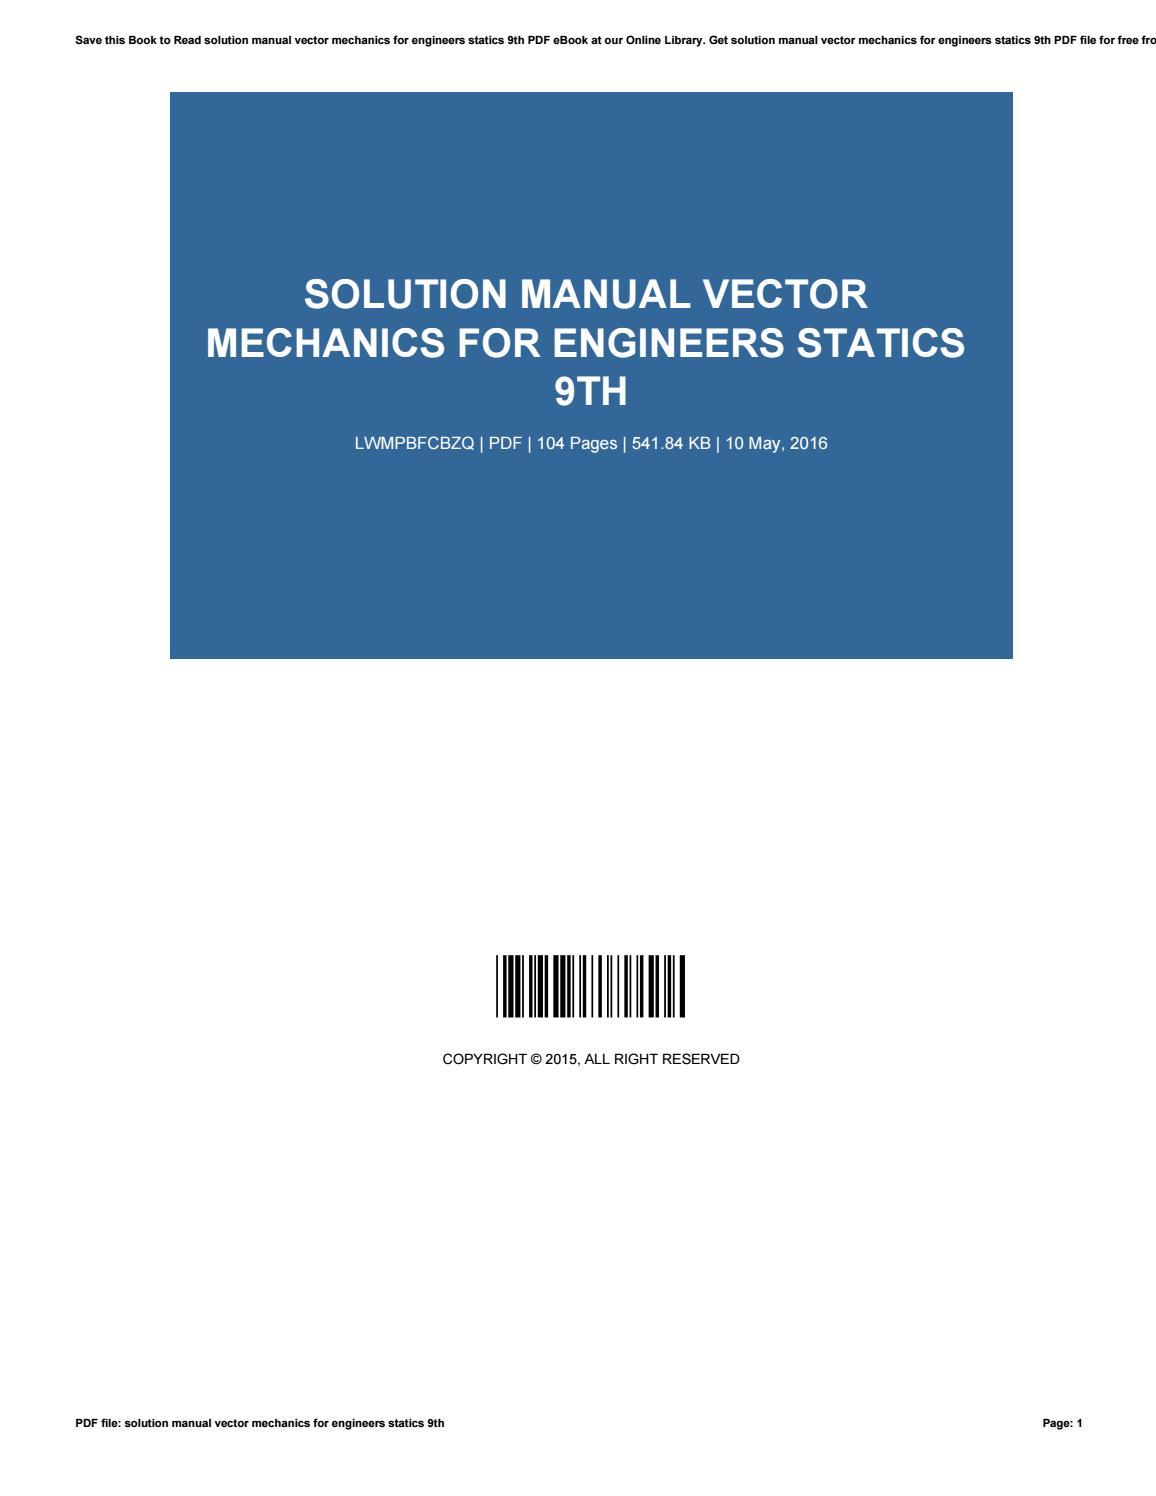 vector mechanics for engineers solution manual pdf